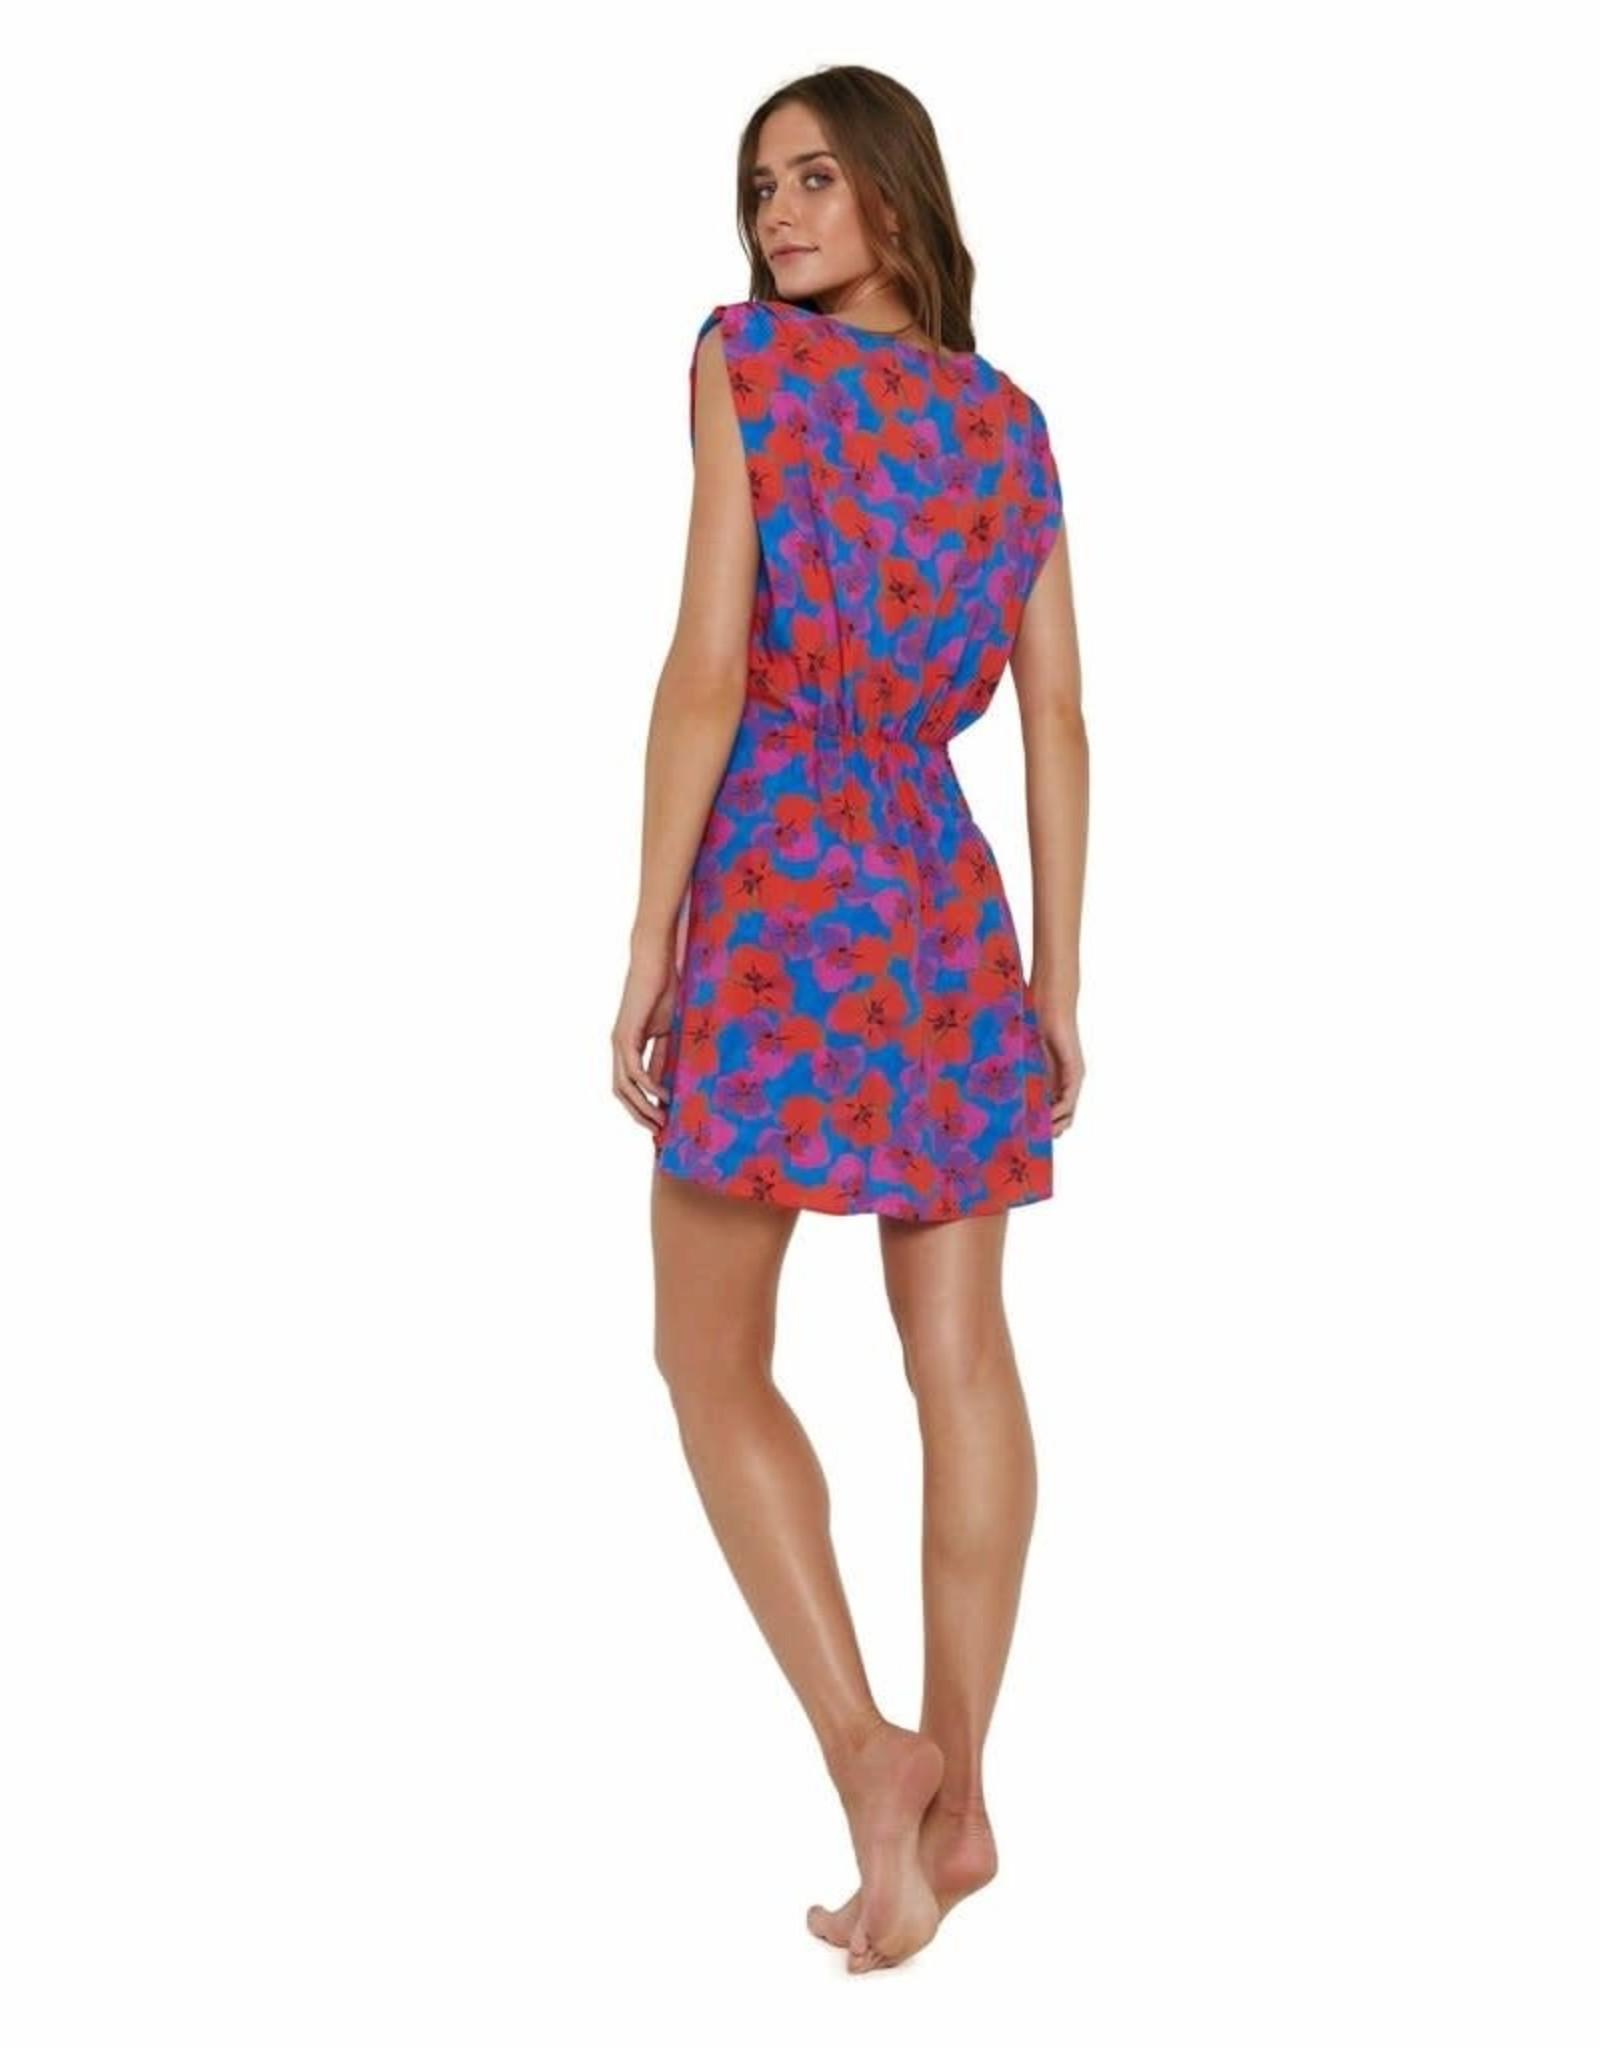 Vix Mabel Gisele Short Caftan Dress